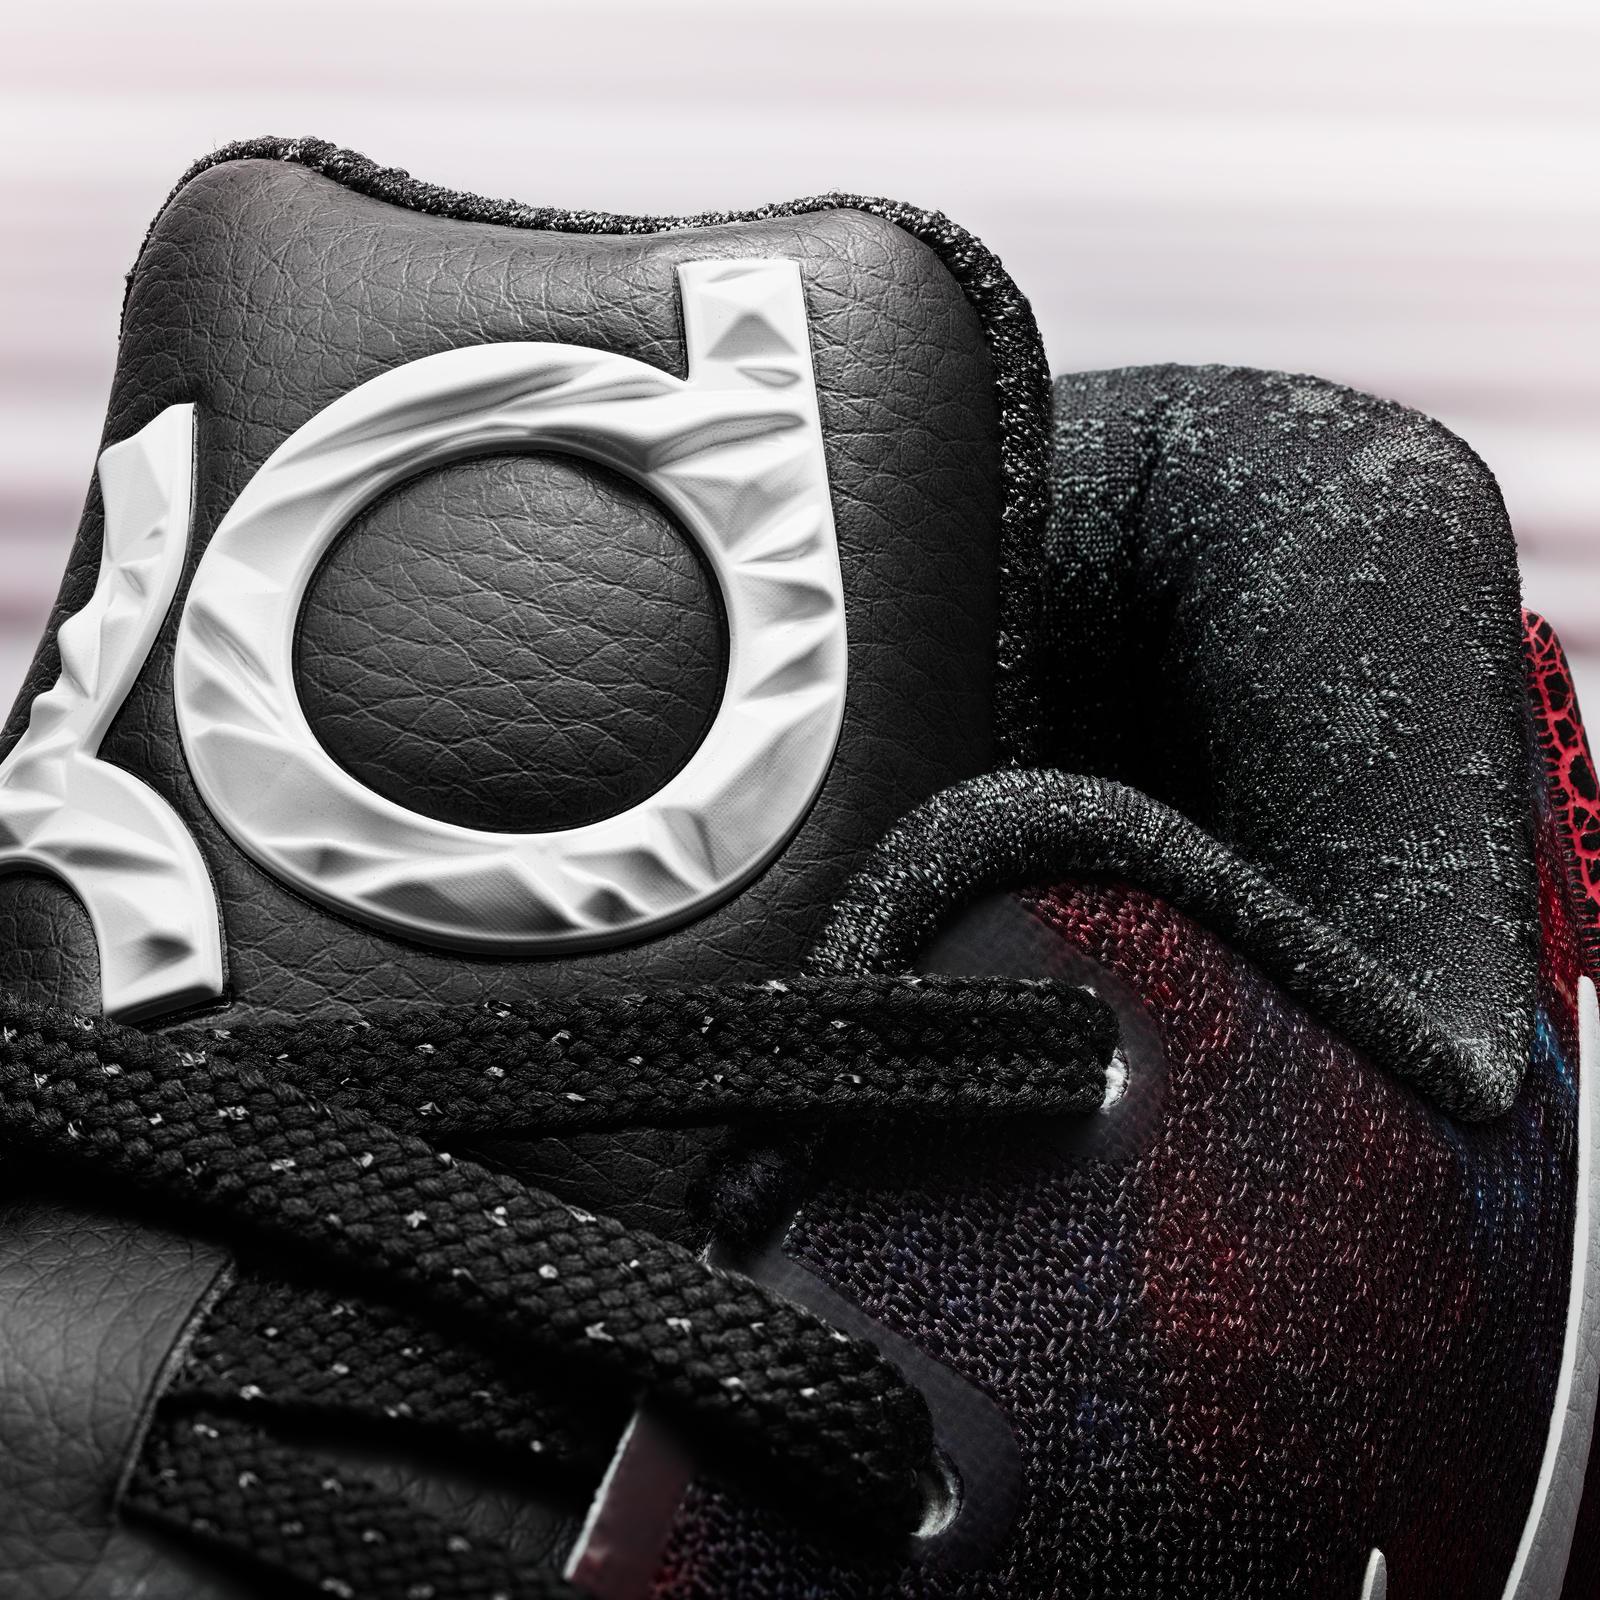 15-600_Nike_Holiday_KD_7_Detail_B-01